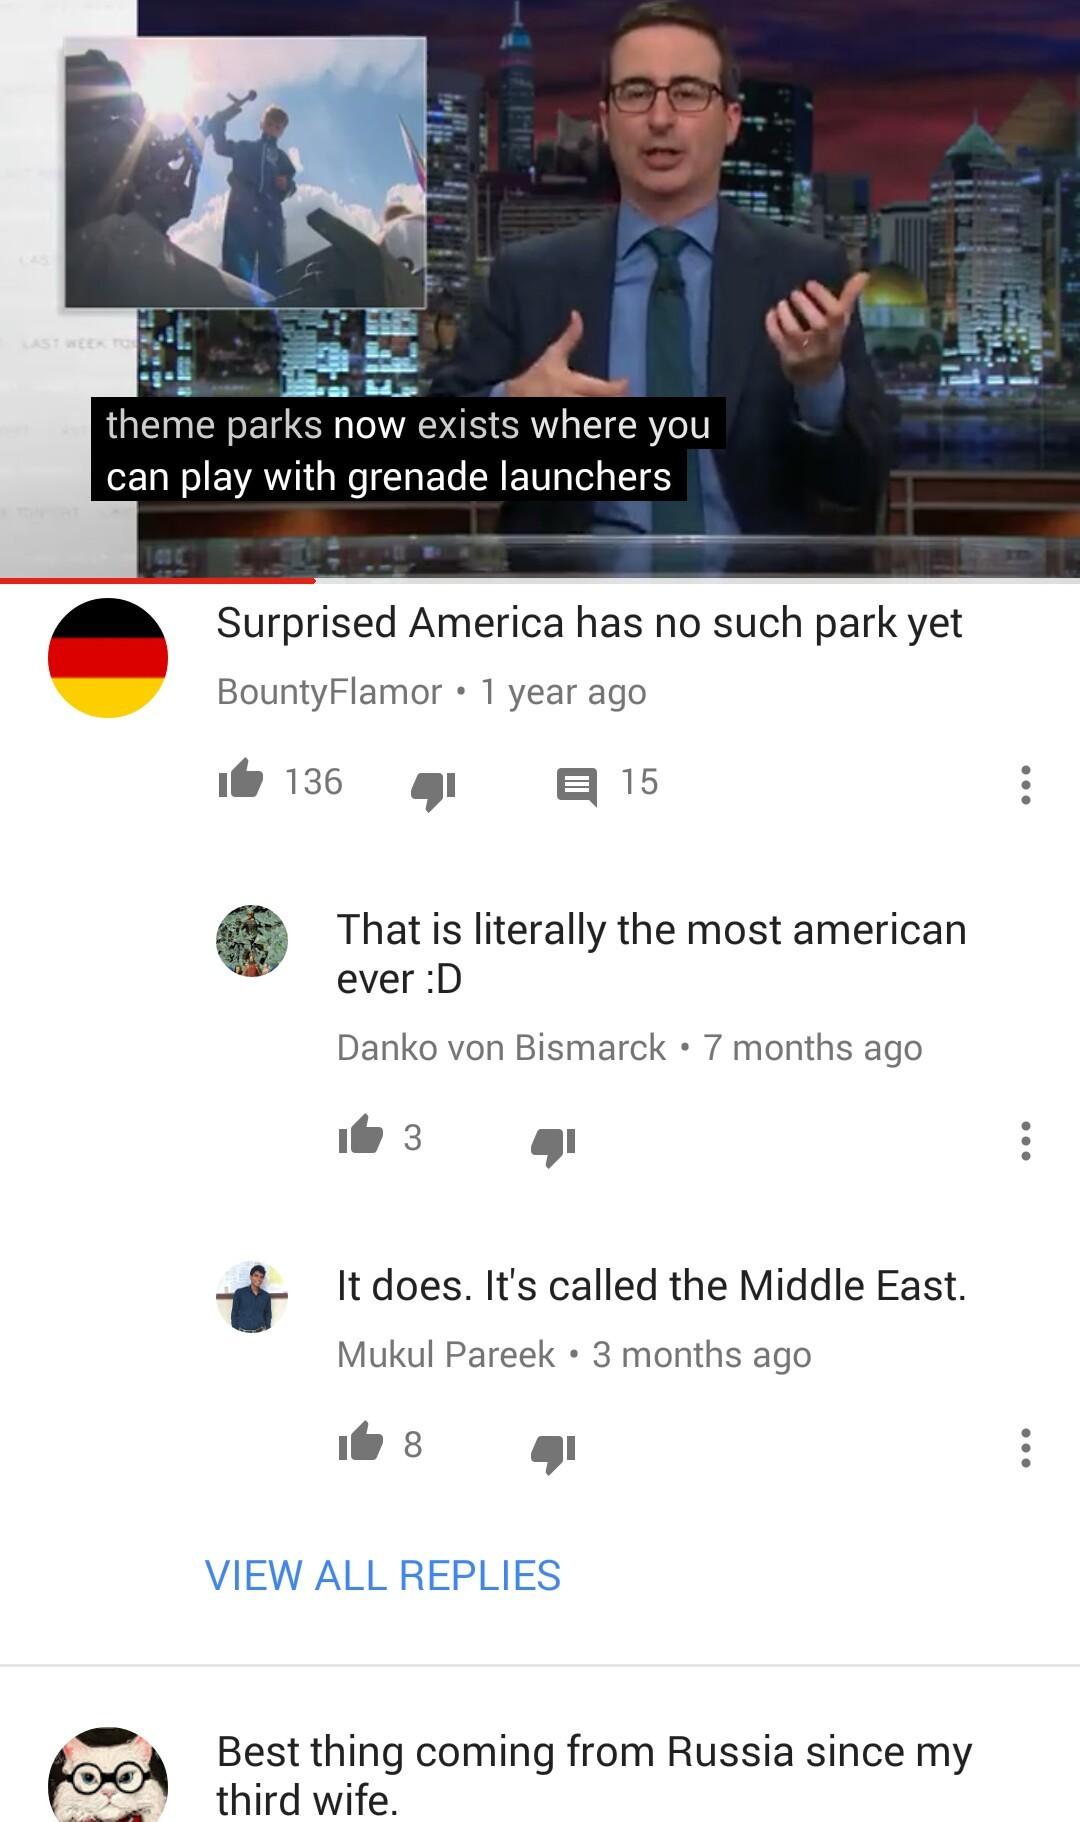 So Russia has a new theme park... - meme